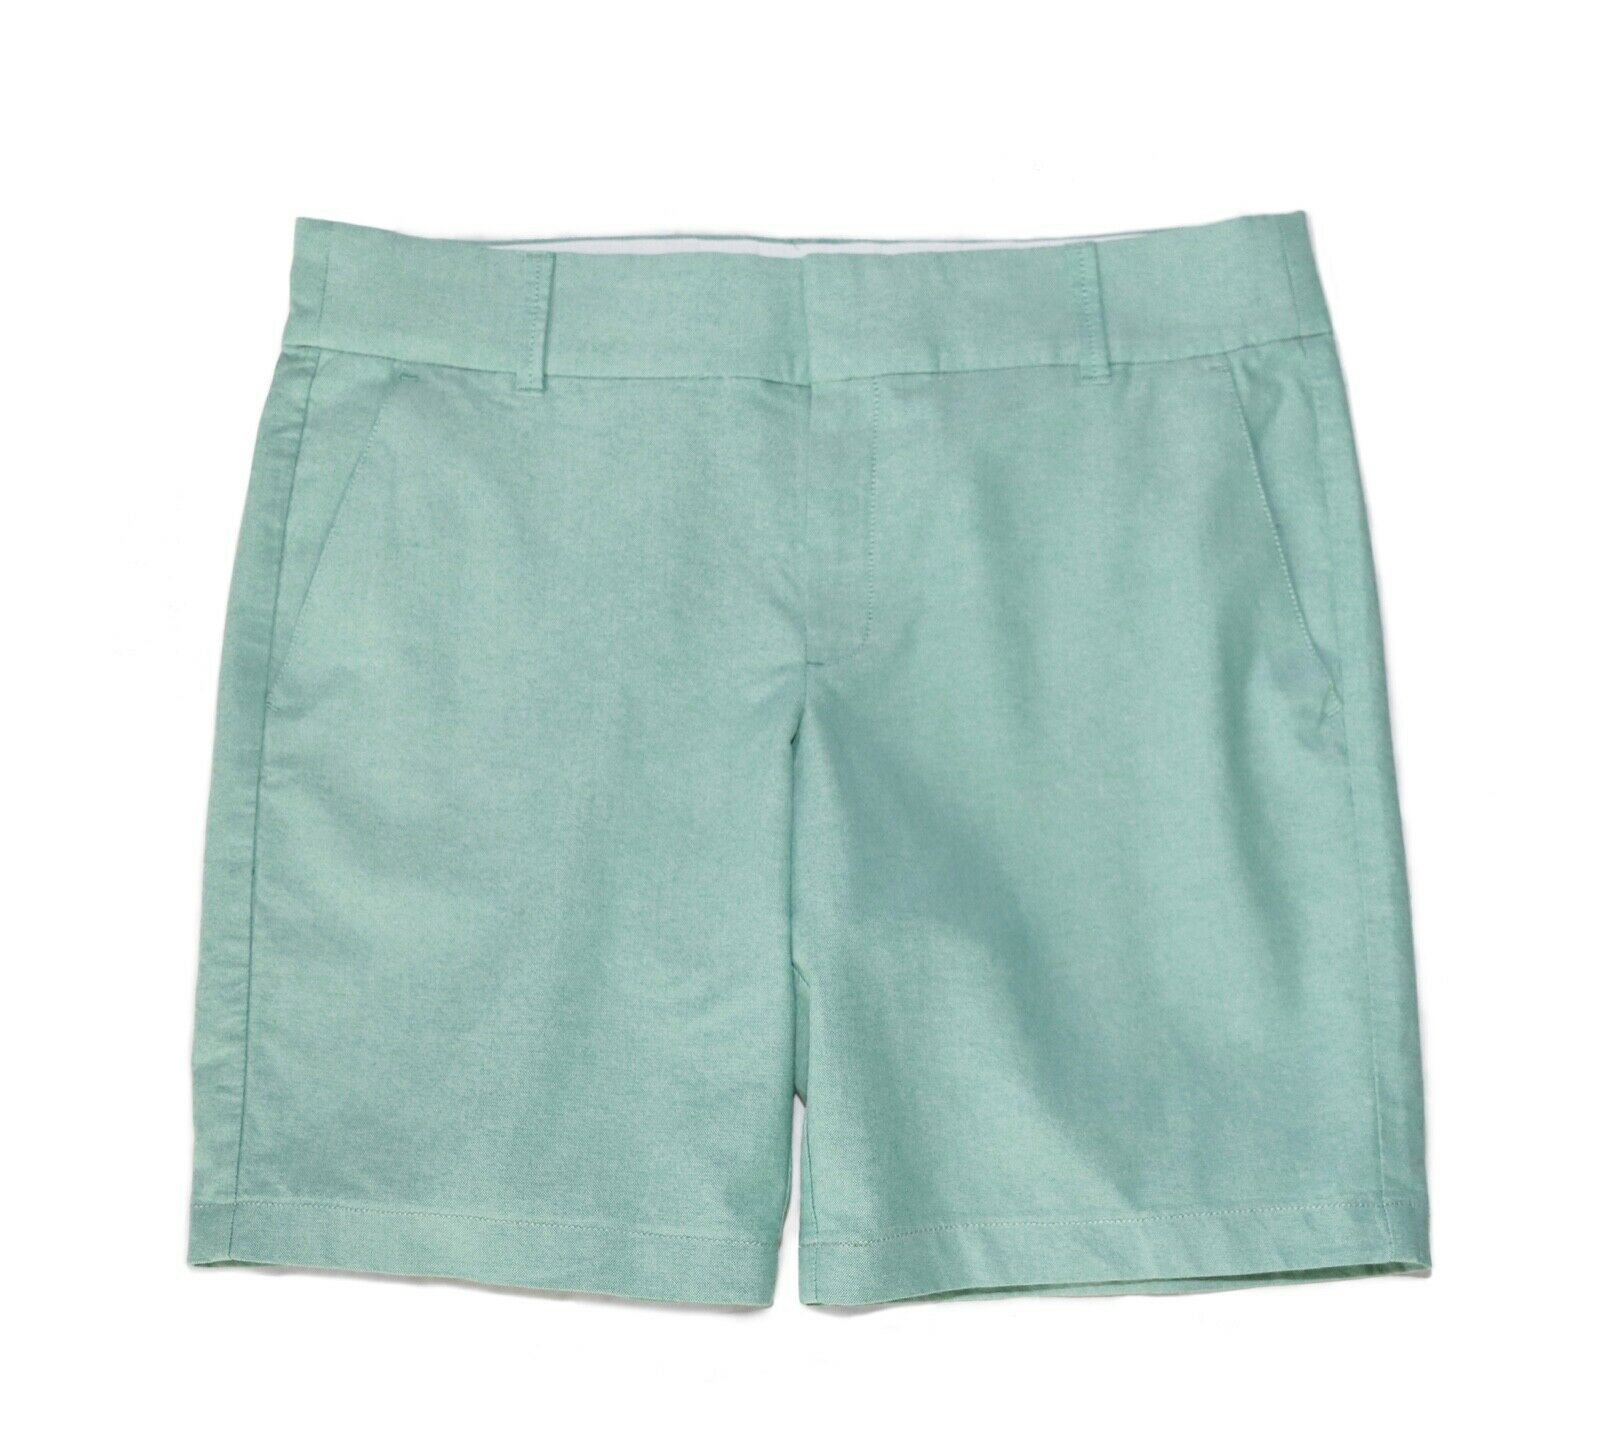 J.Crew Factory - Women's 8 - NWT - Green Oxford Bermuda Frankie Shorts  J0813